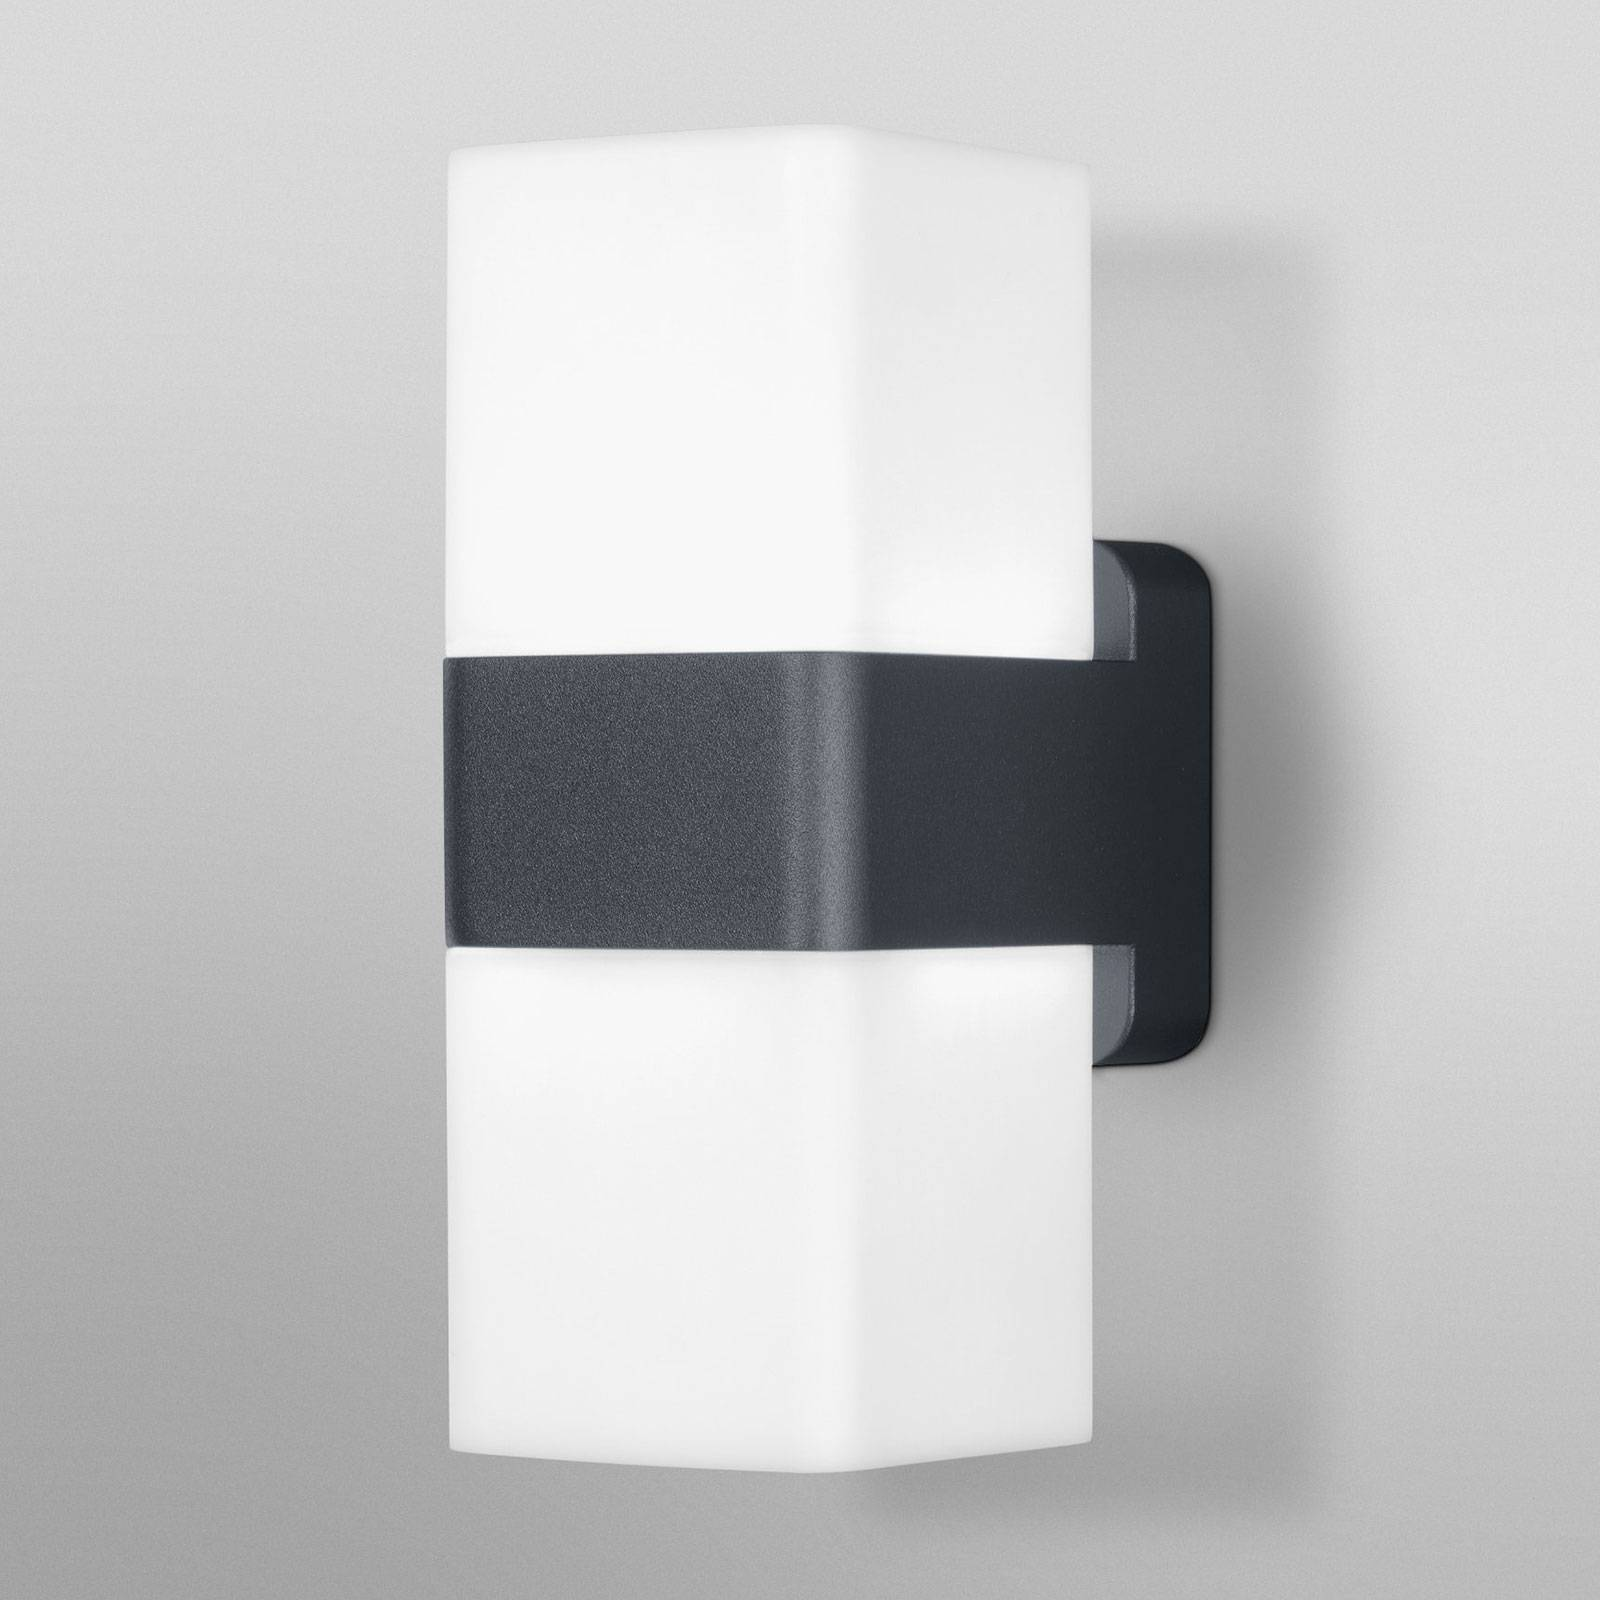 LEDVANCE SMART+ WiFi Cube-seinälamppu RGBW up/down